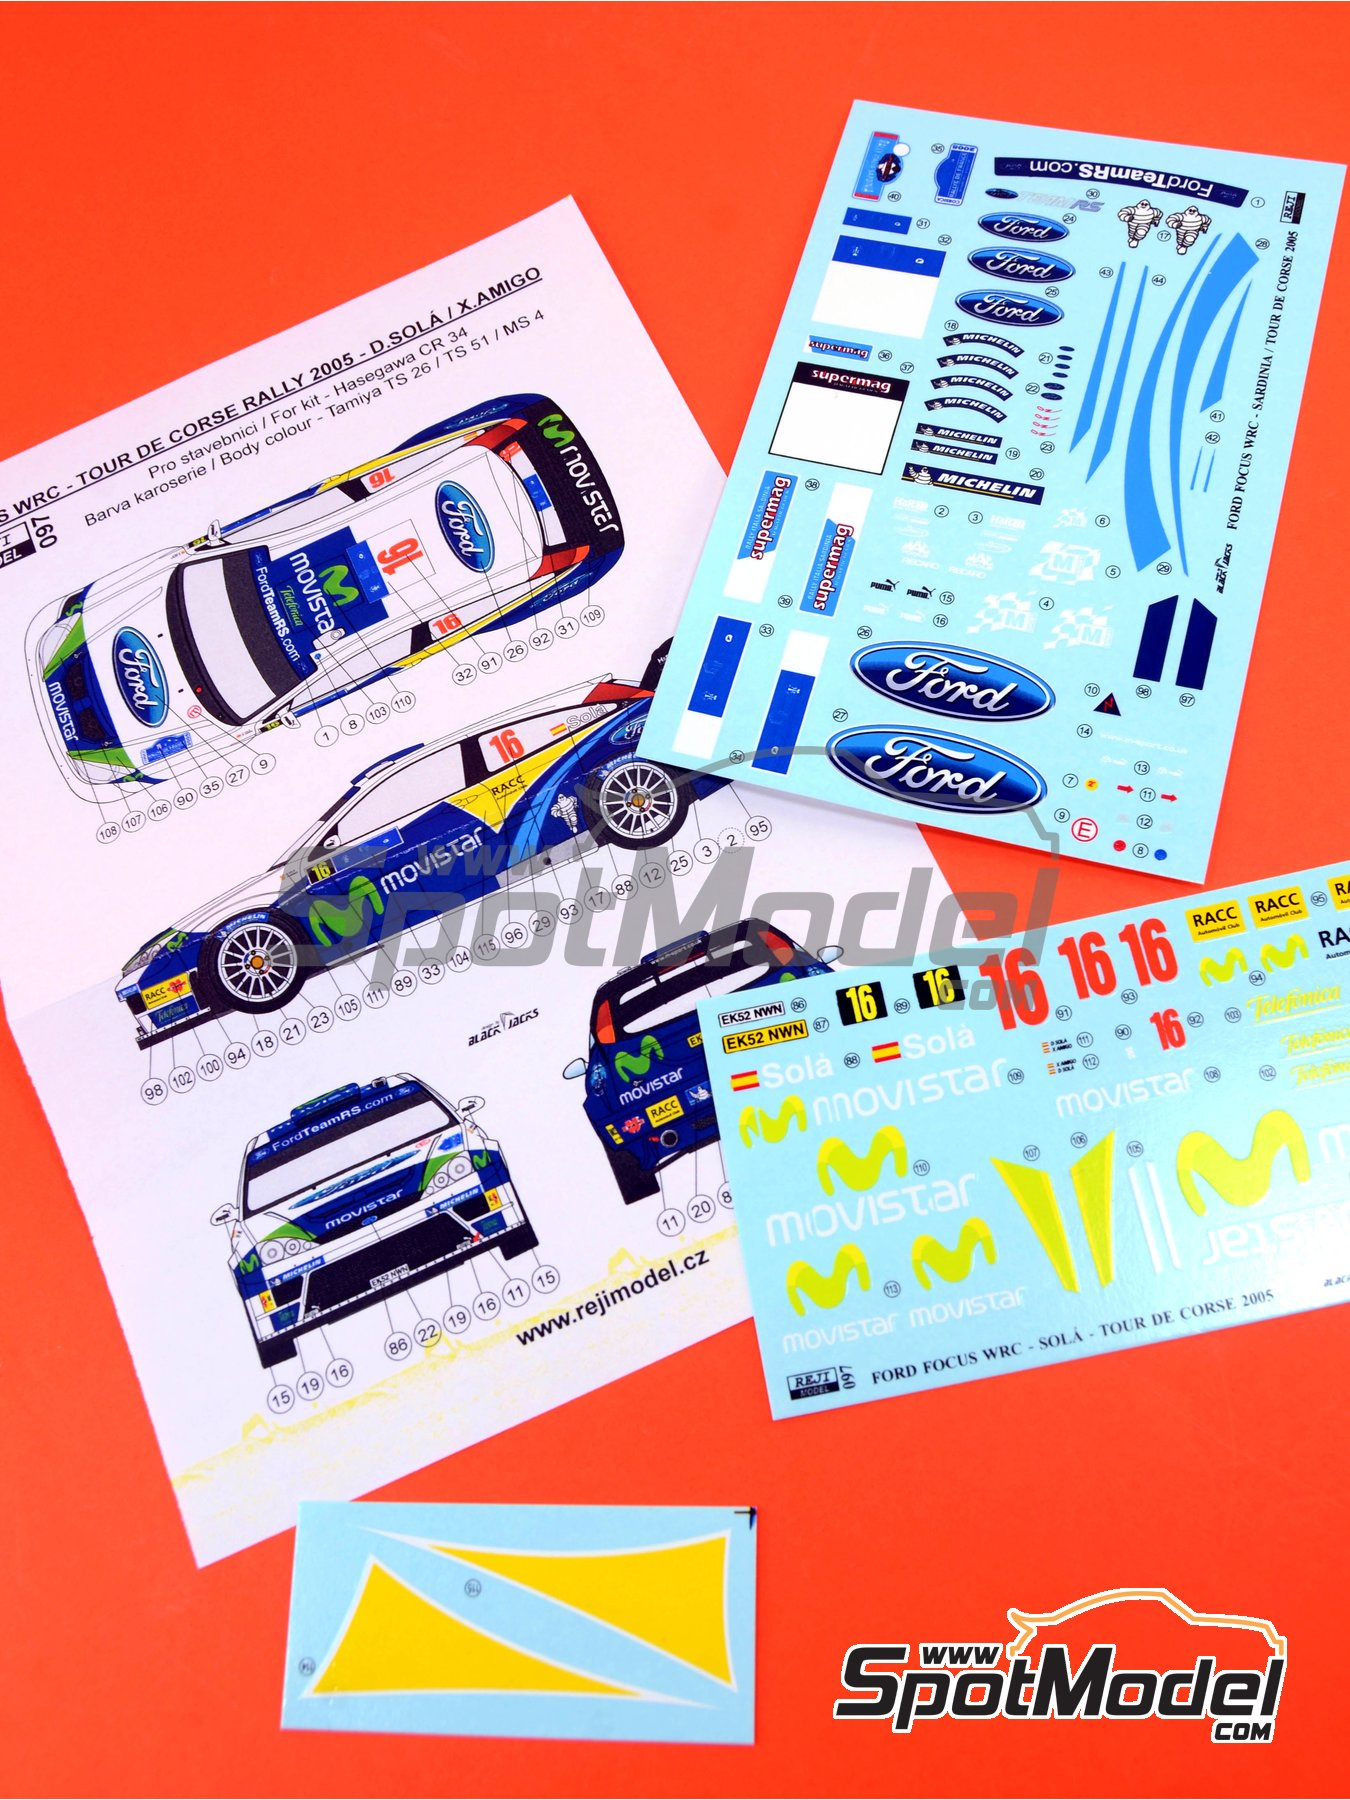 Ford Focus WRC Movistar - Tour de Corse 2005 | Marking / livery in 1/24 scale manufactured by Reji Model (ref.REJI-097) image